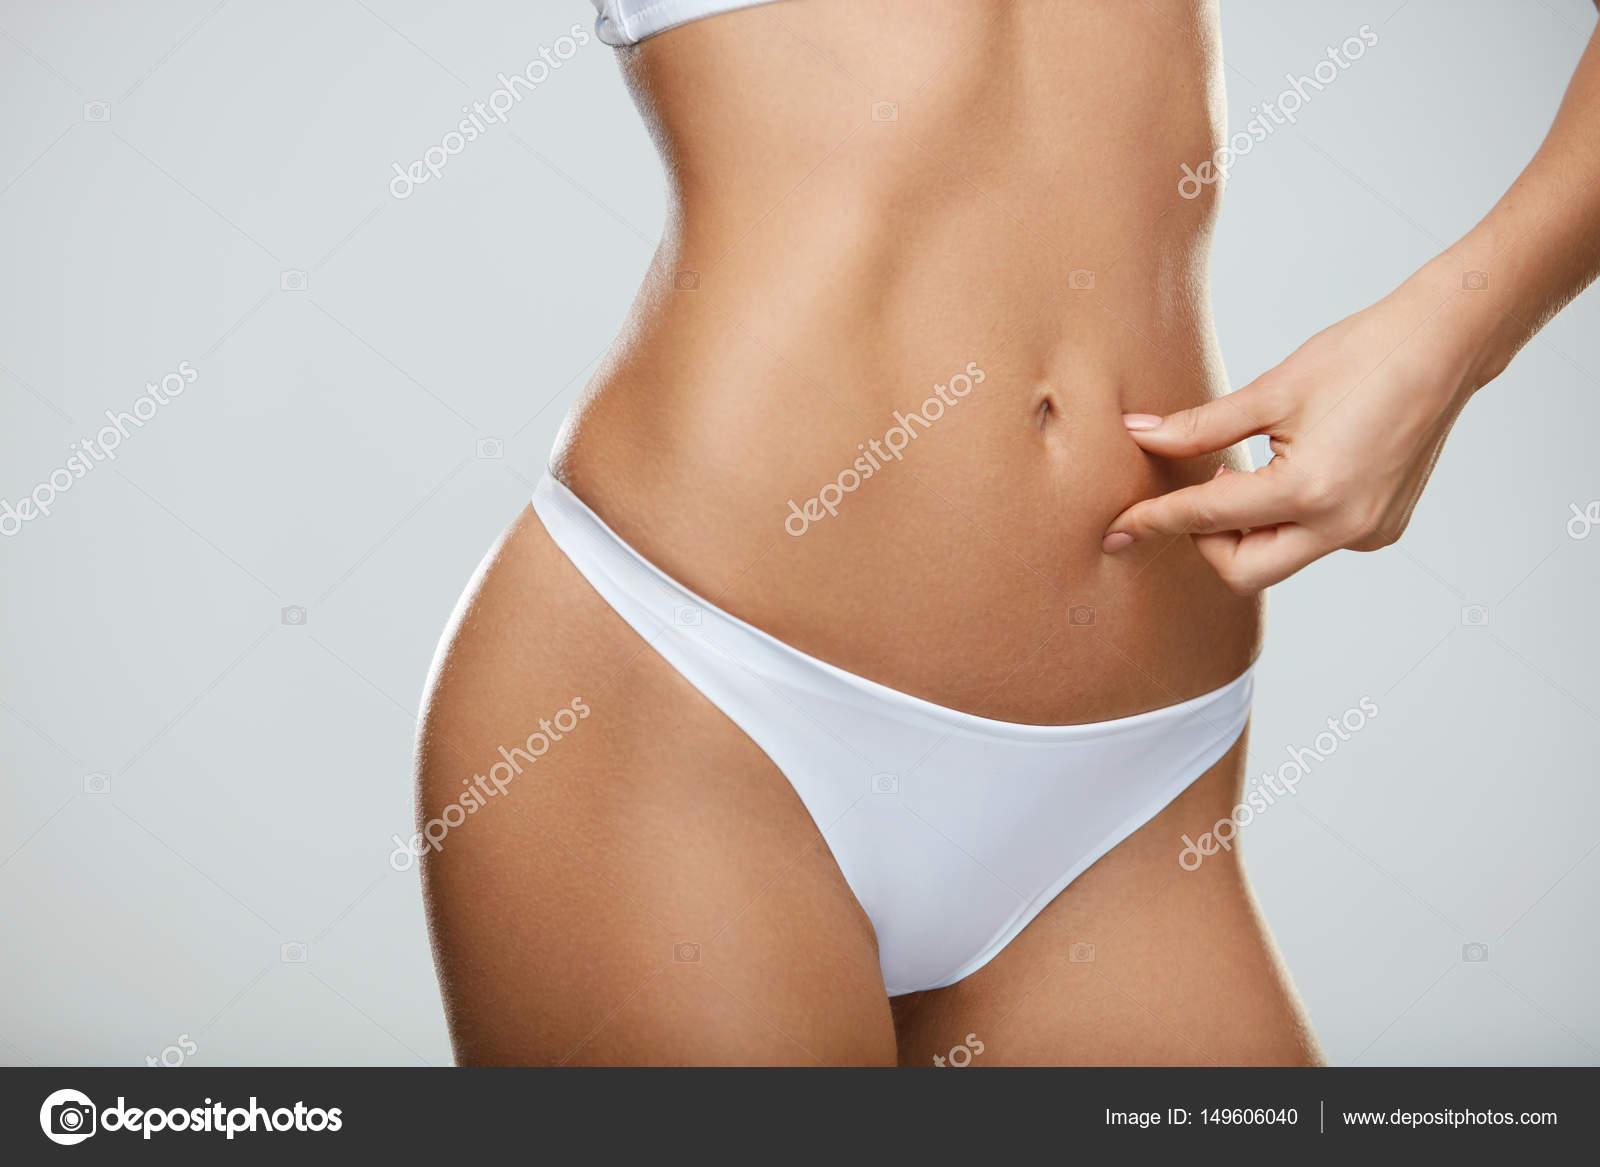 Hot girl hand in panties can not